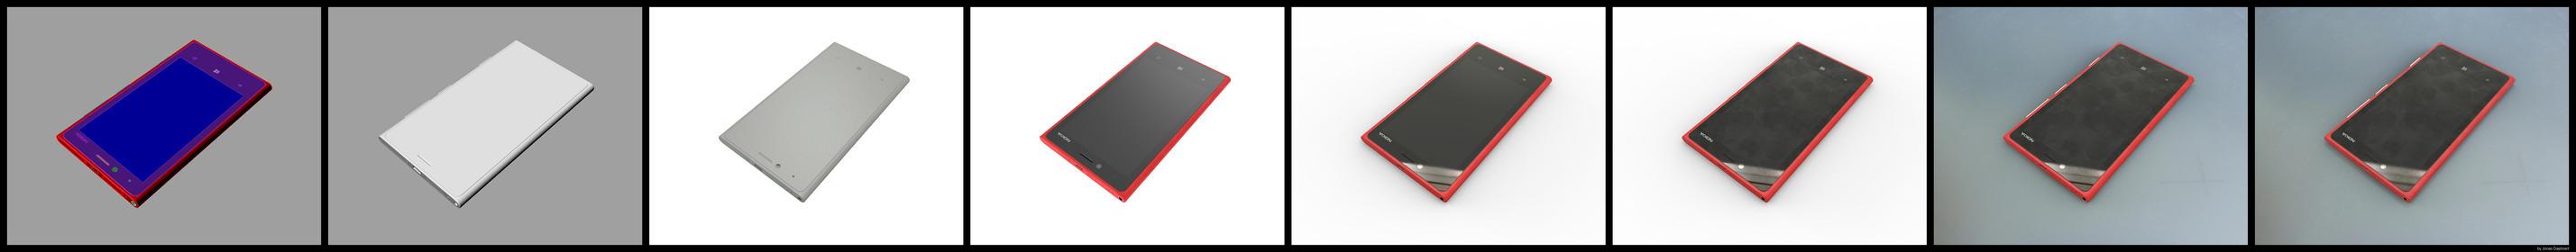 Photorealistic Rendering Steps Nokia Lumia 820 by JonDae